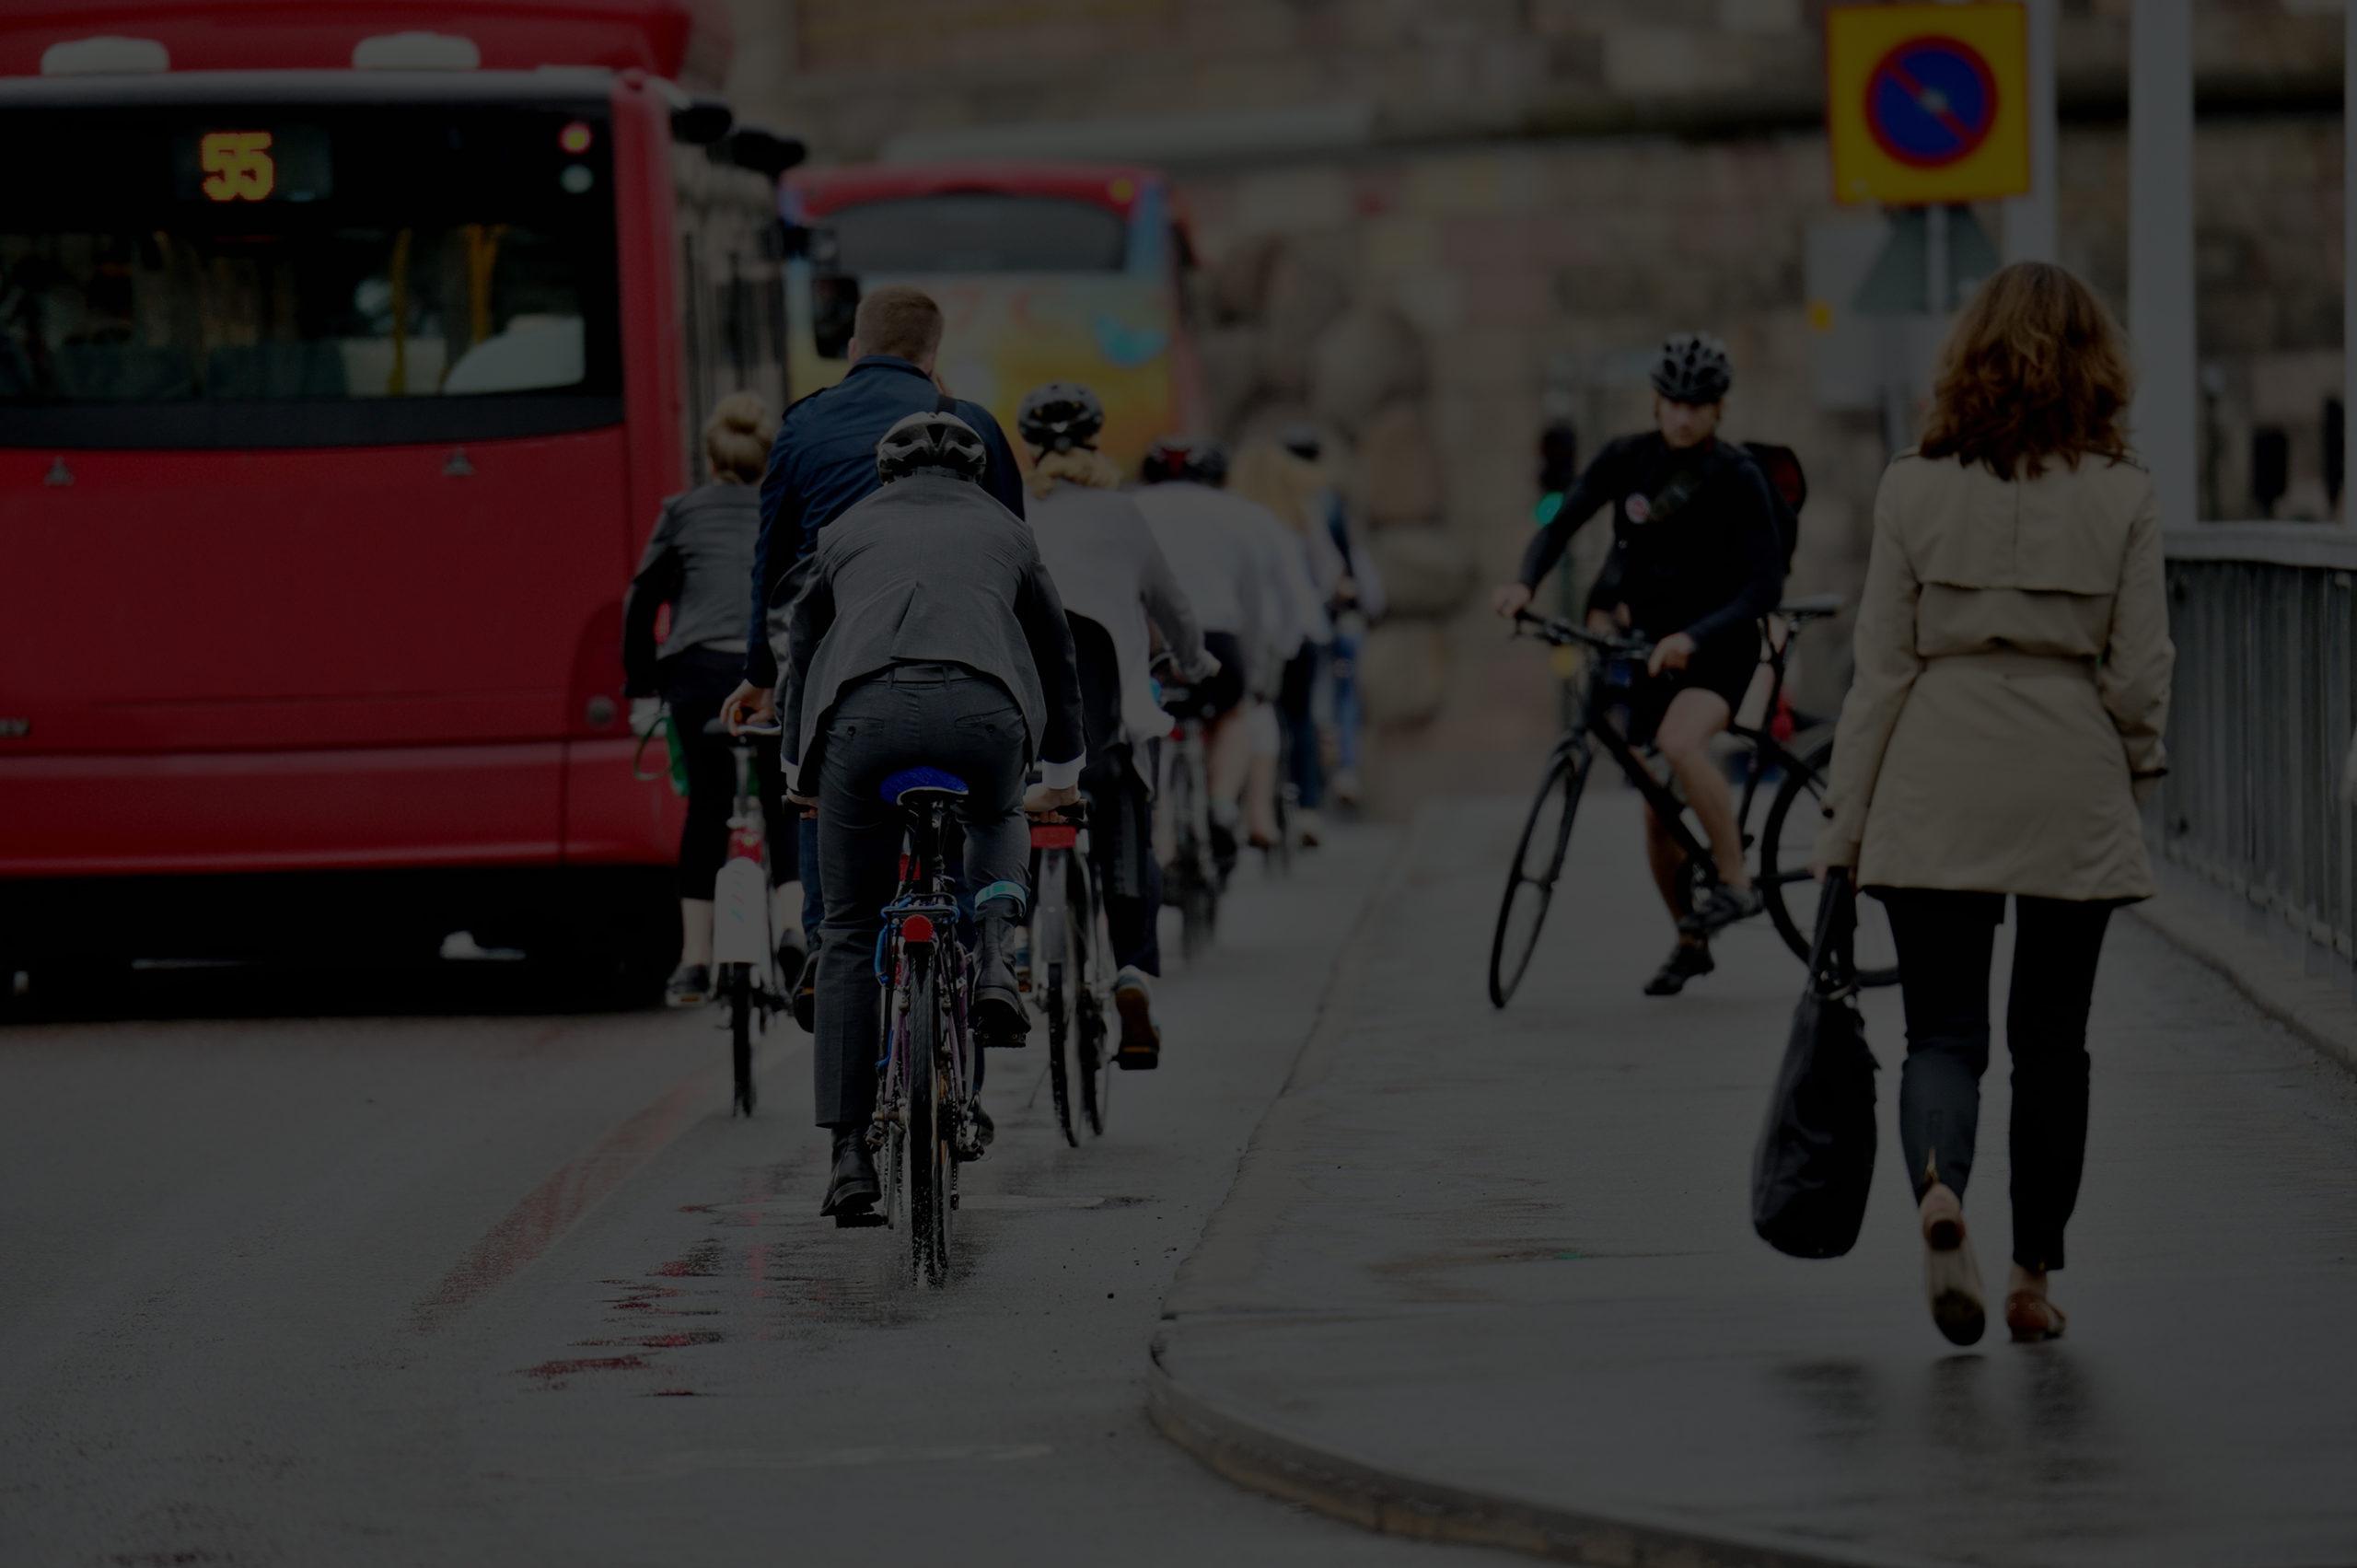 cyclists near red london bus using AVAS